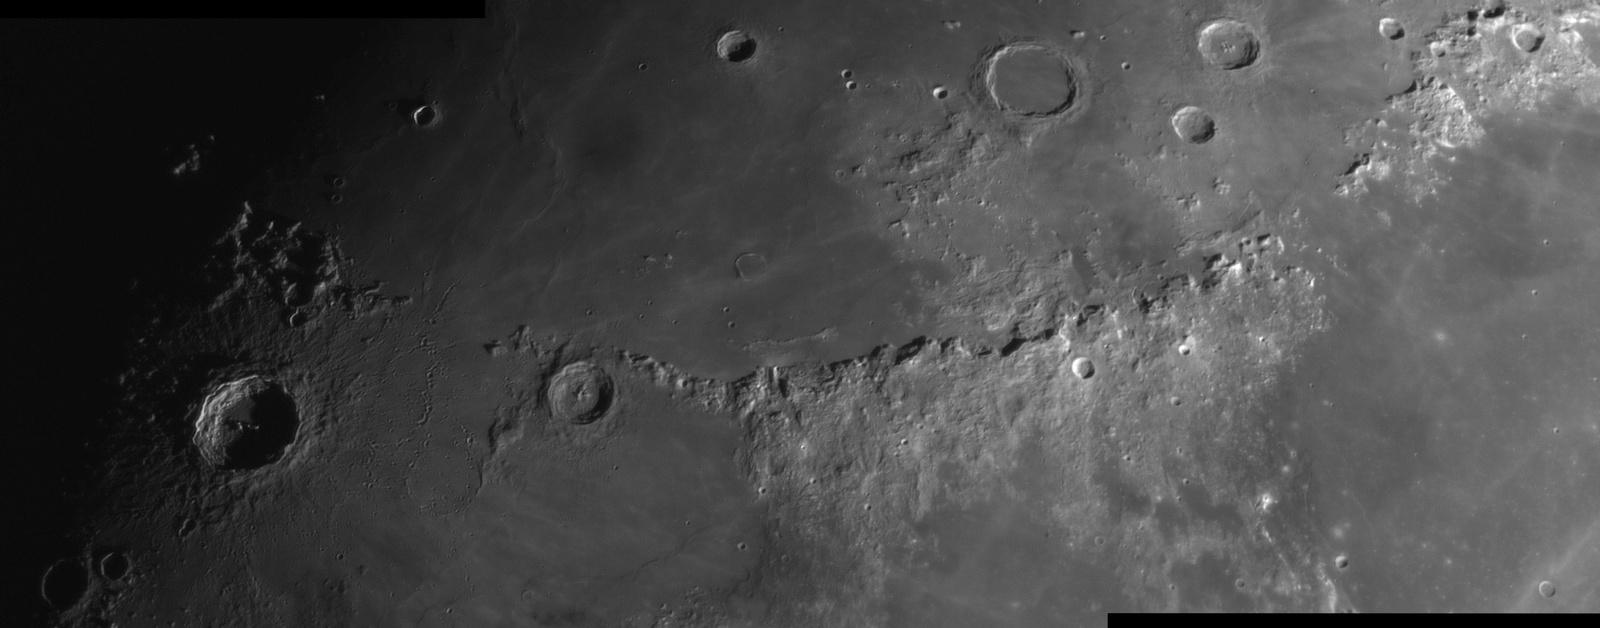 1125005378_Panorama_CopernicusEratosthenesiApeninyB2x_11_07.2019r_20.45_TS152F2600_ASI290MM_Halpha35nm_mozaika105....thumb.jpg.bbeaa78a8a0a9df52055fa1946344aff.jpg